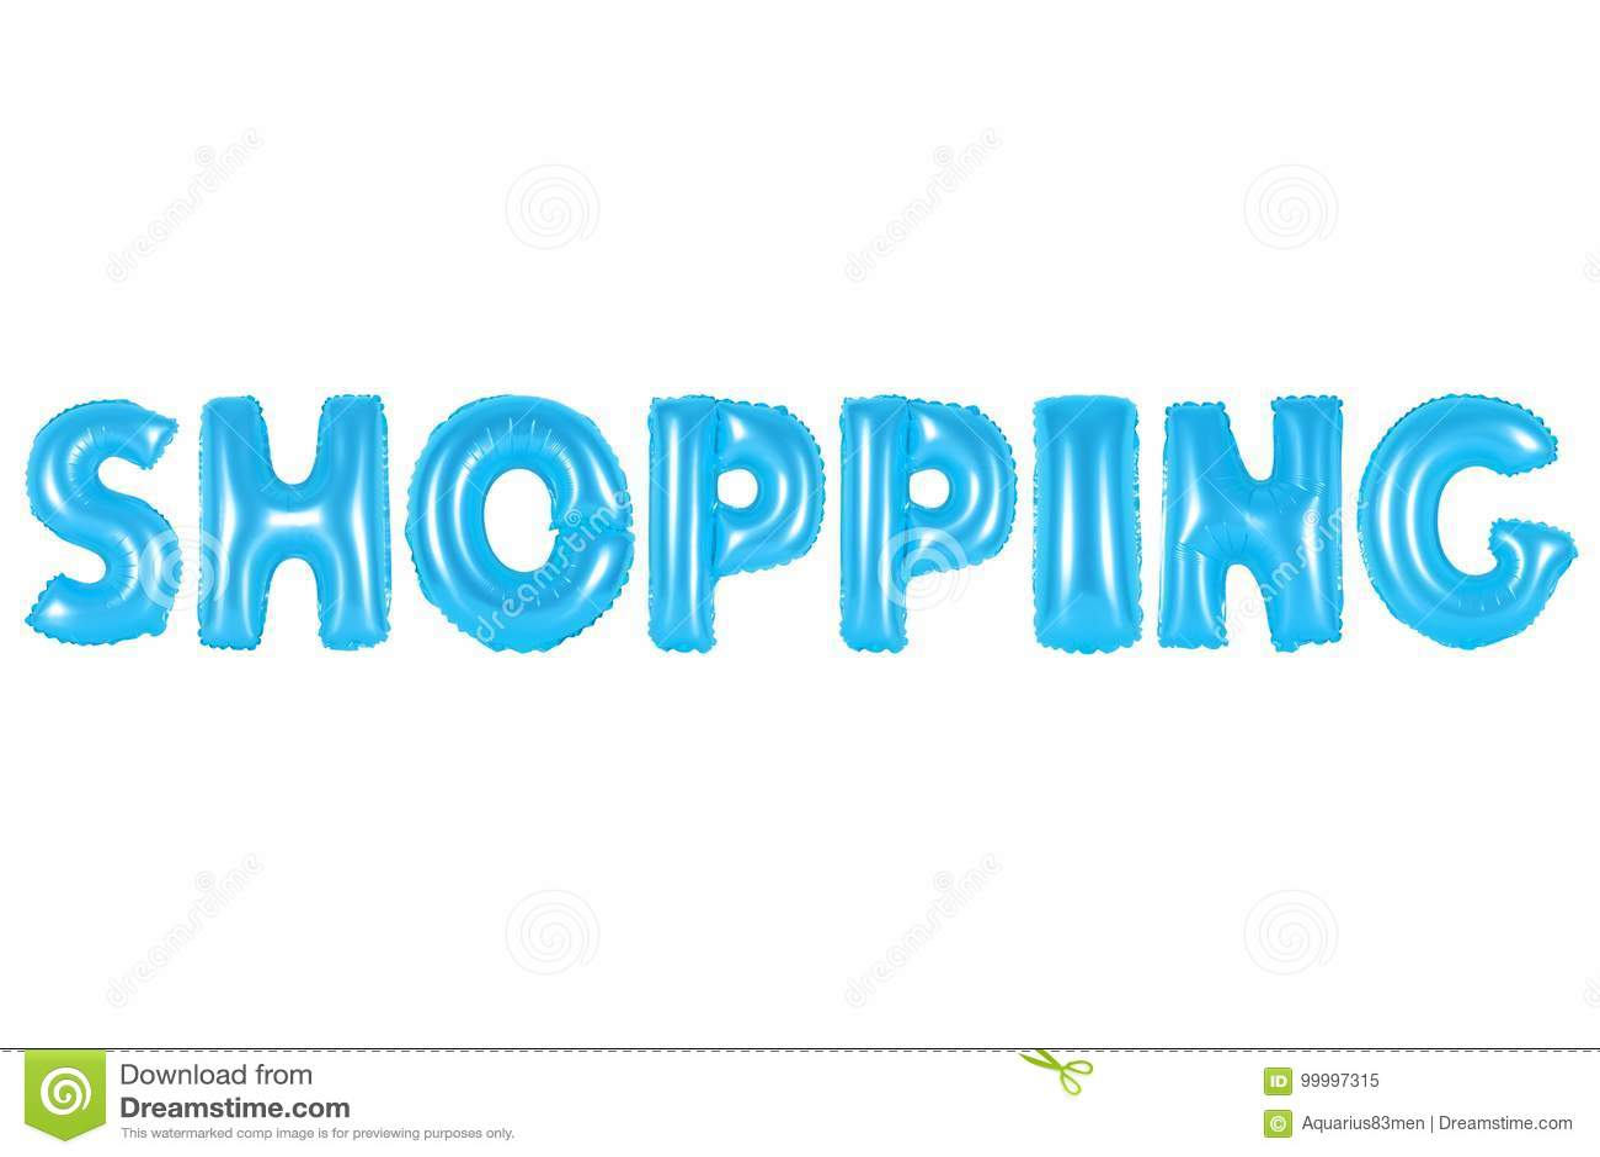 Shopping, blue color stock image. Image of children, hobby - 99997315